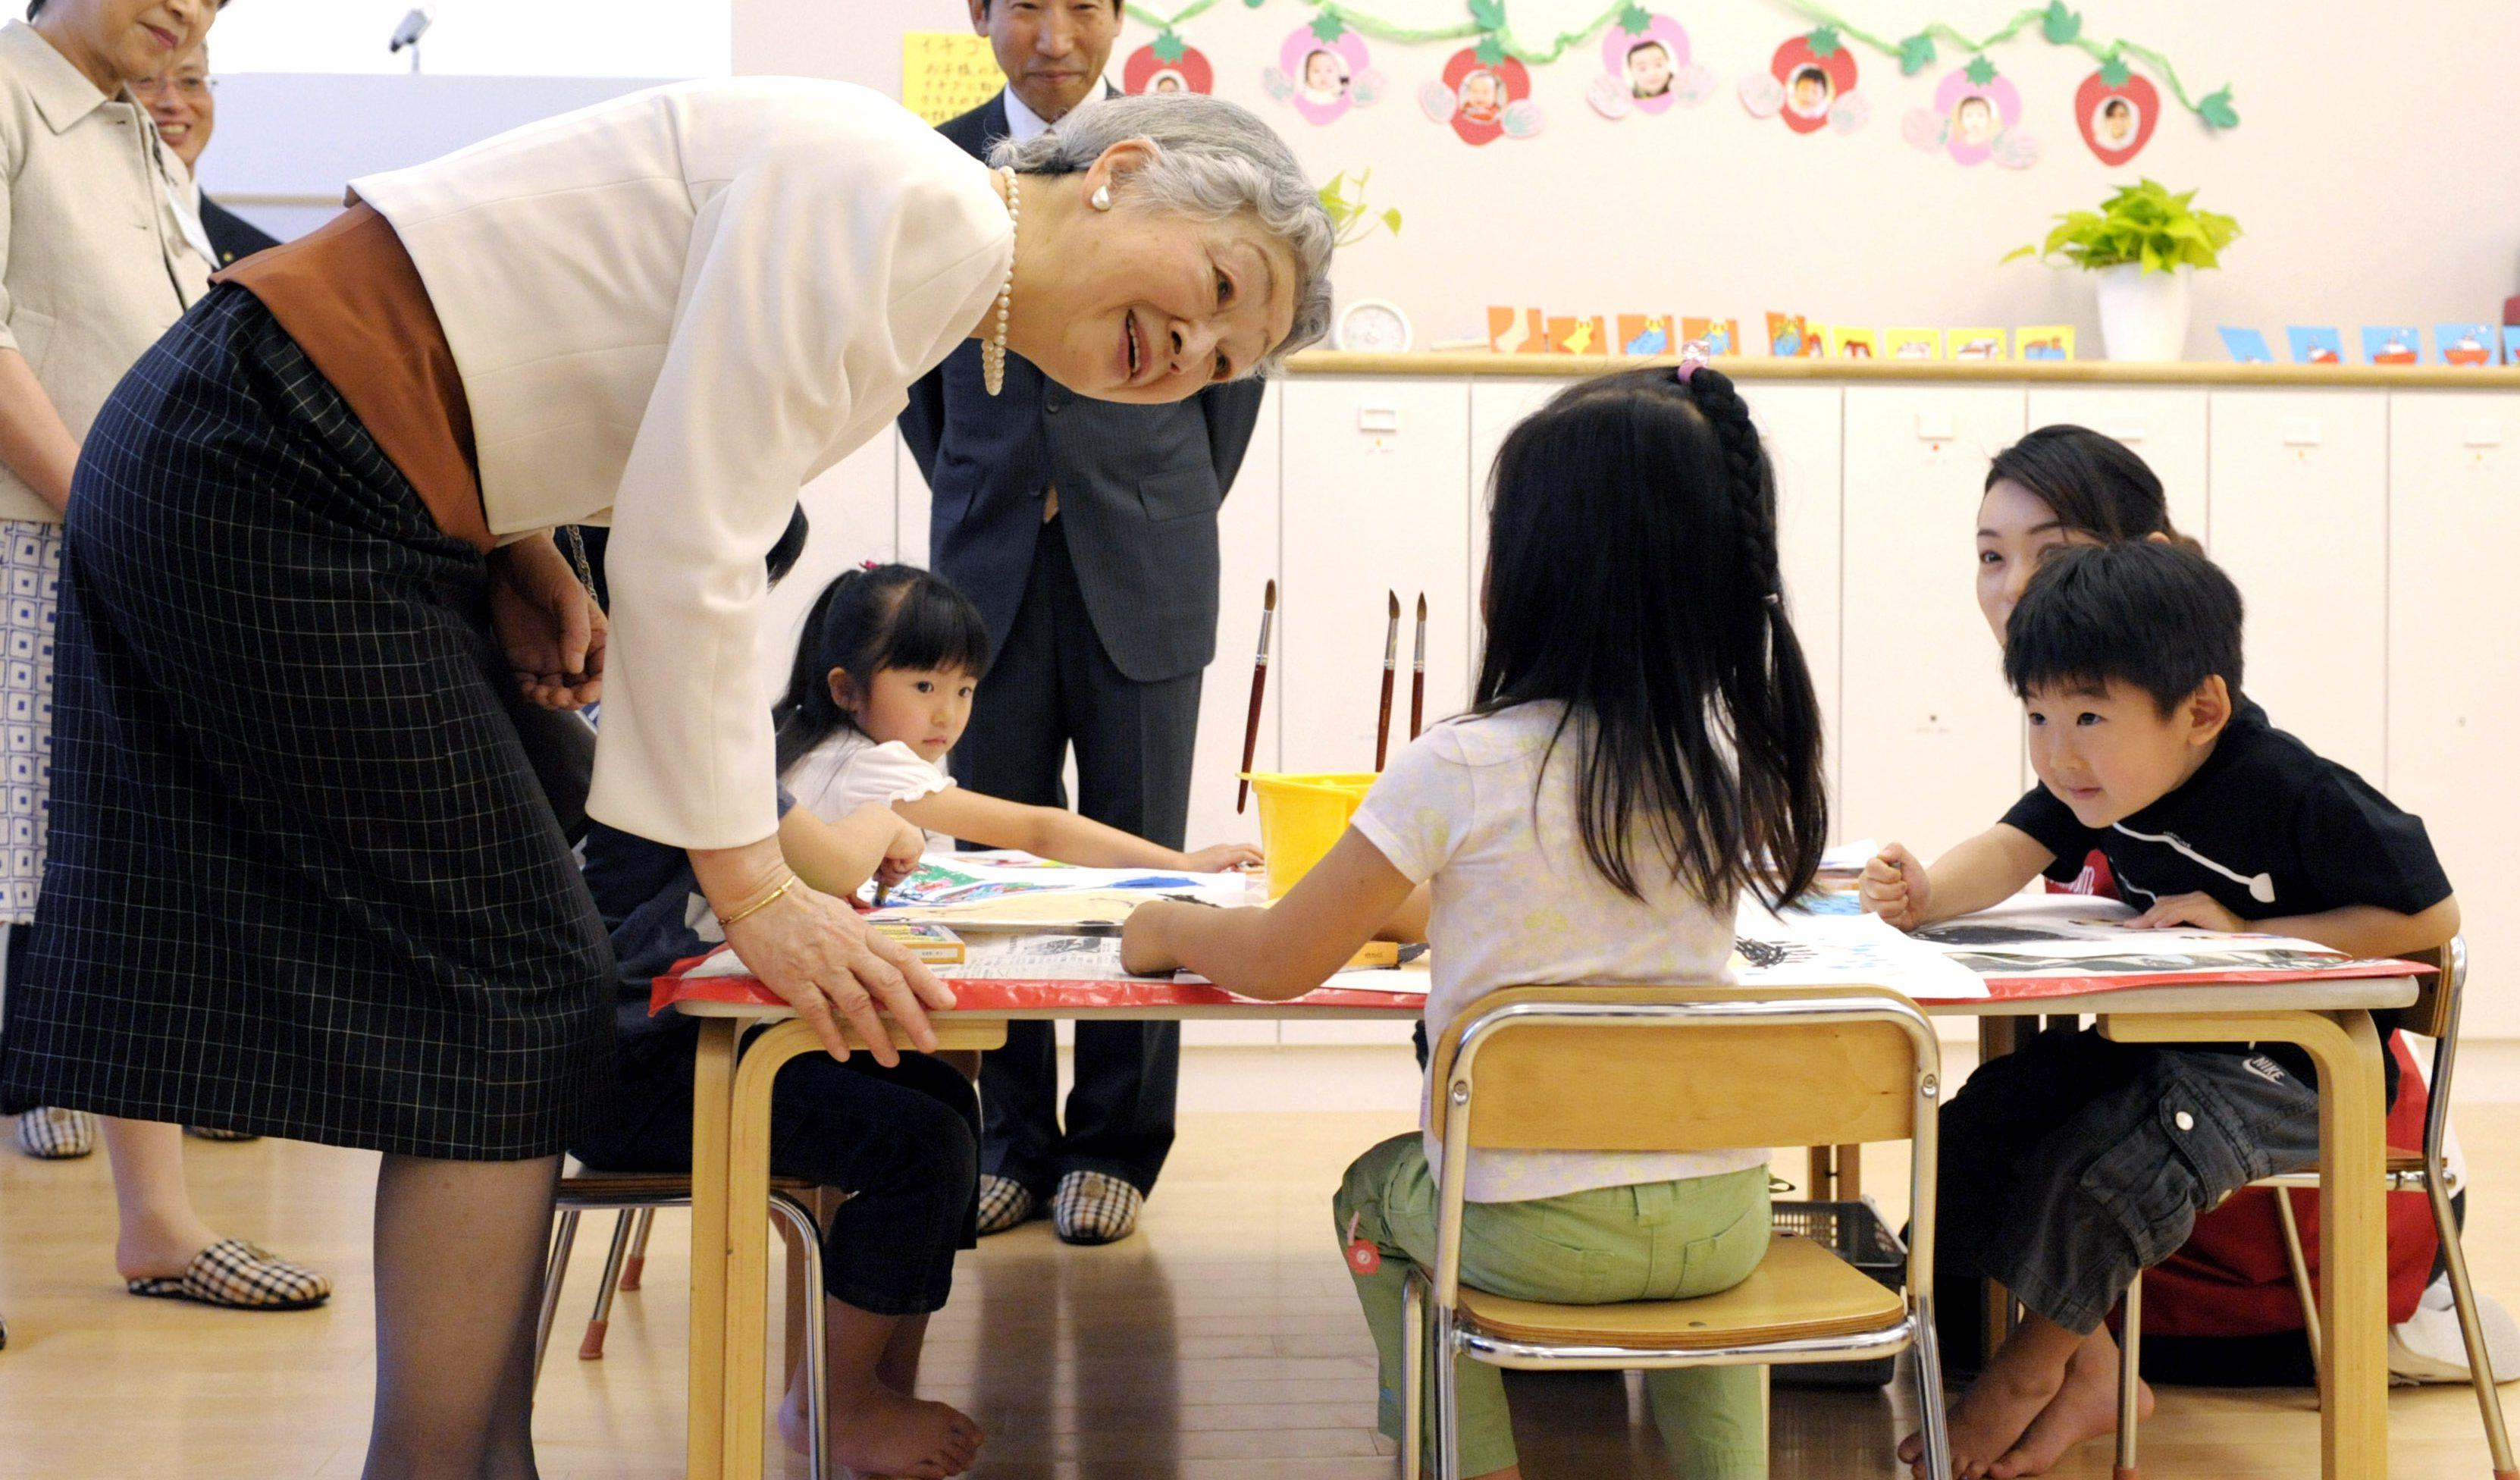 Japanese Empress Michiko visits Shiseido's Kangaroom daycare center in Shiodome in Tokyo, May 15, 2009.